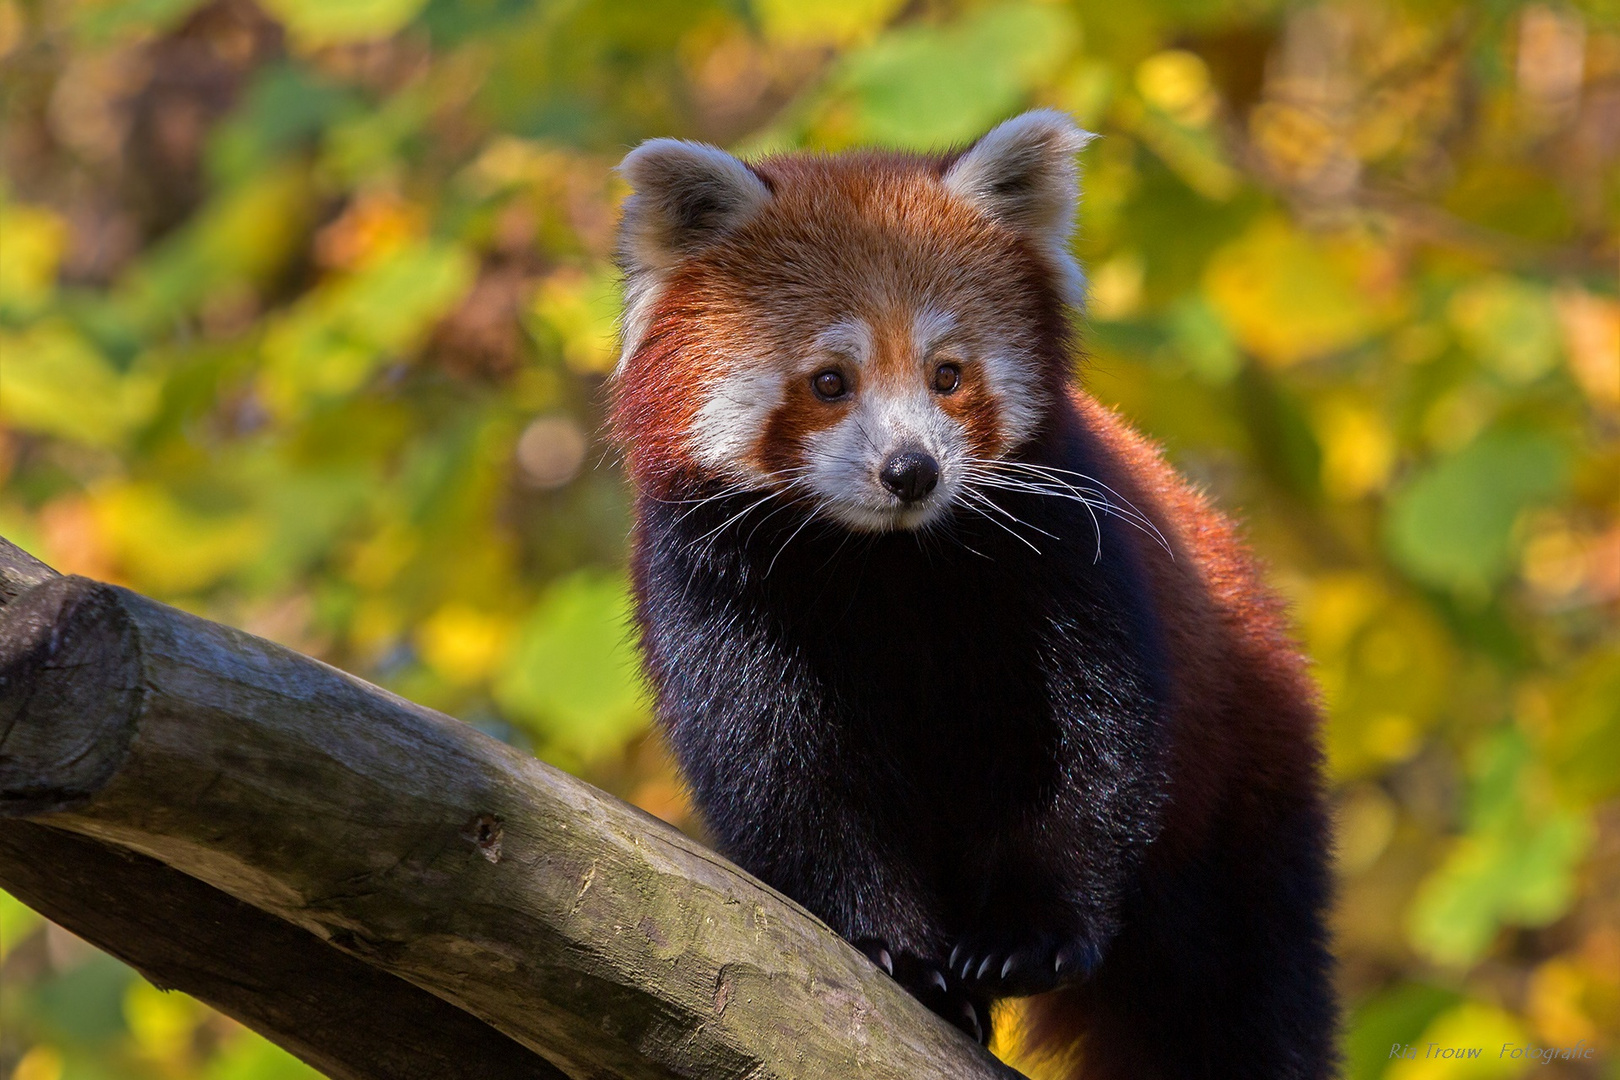 roter panda foto bild natur zoo tiere bilder auf fotocommunity. Black Bedroom Furniture Sets. Home Design Ideas